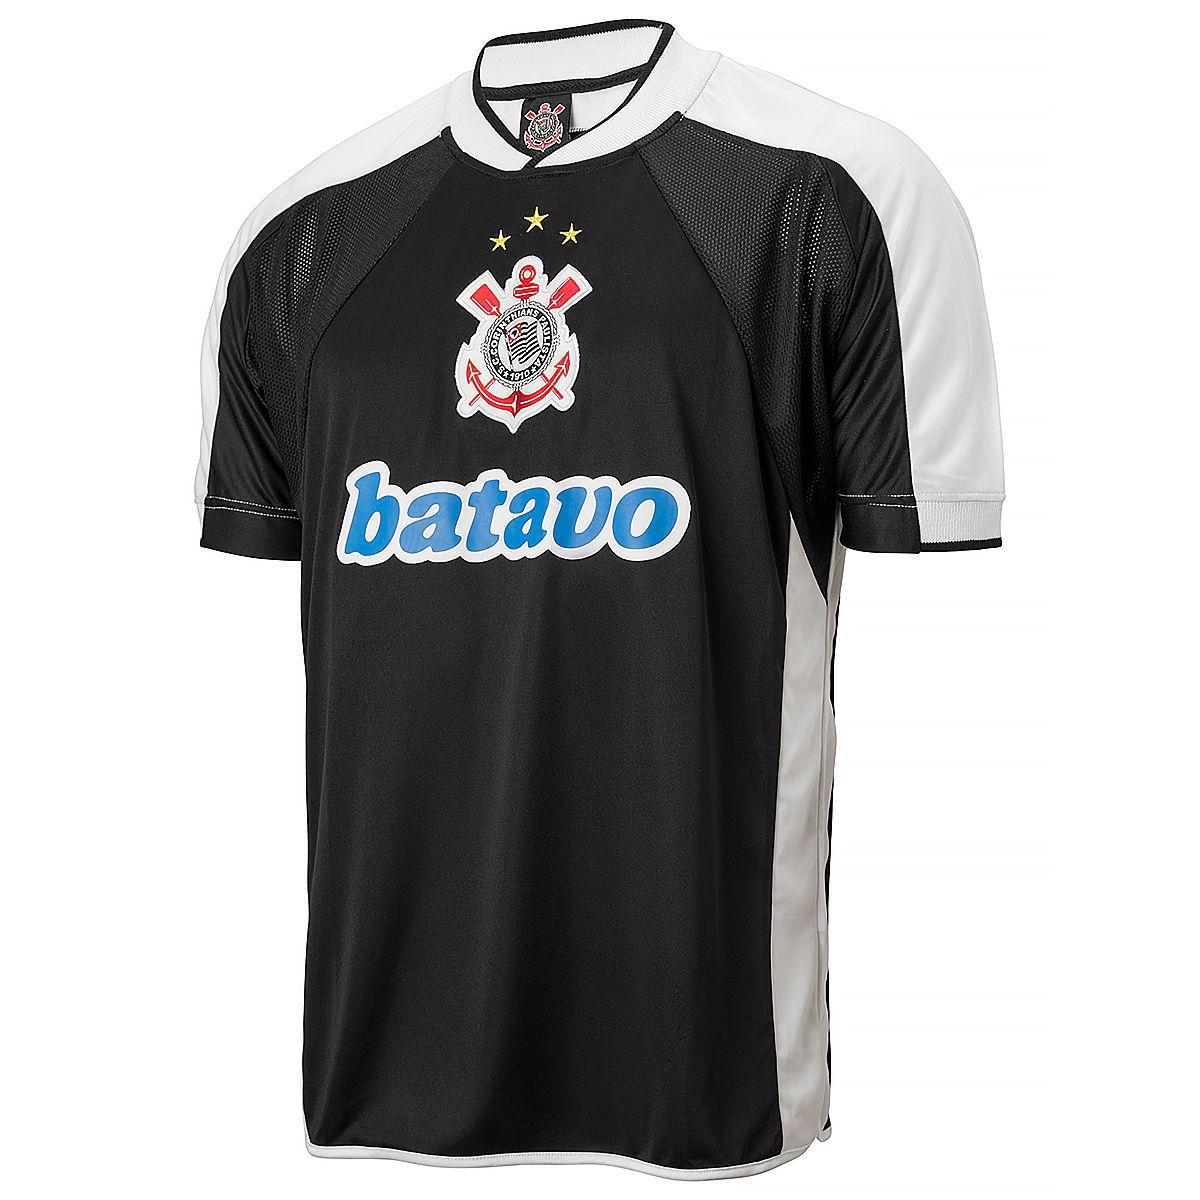 Camisa Corinthians Retrô Mundial 2000 Masculina